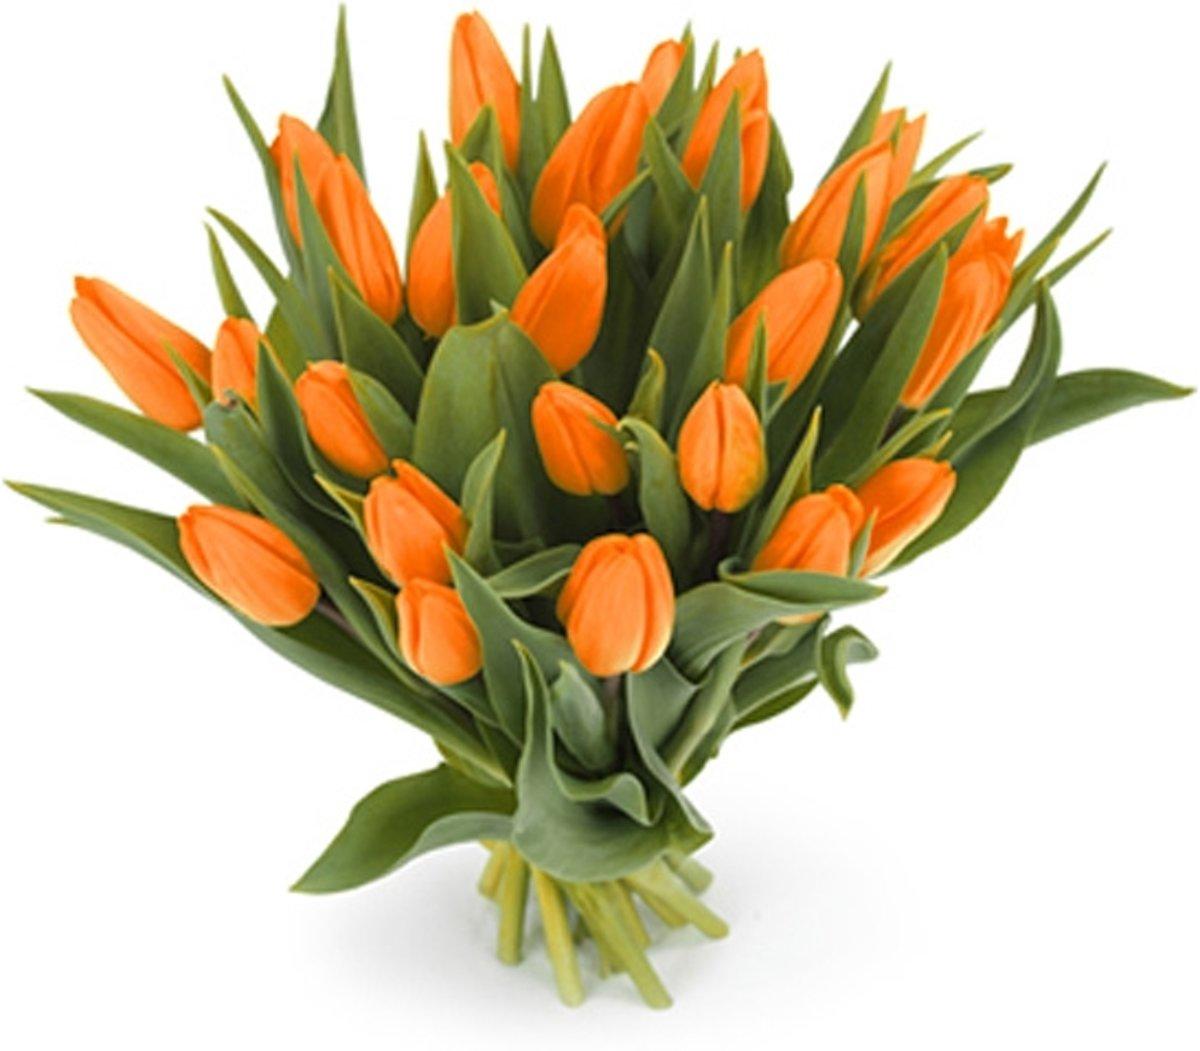 25 oranje tulpen boeket kopen